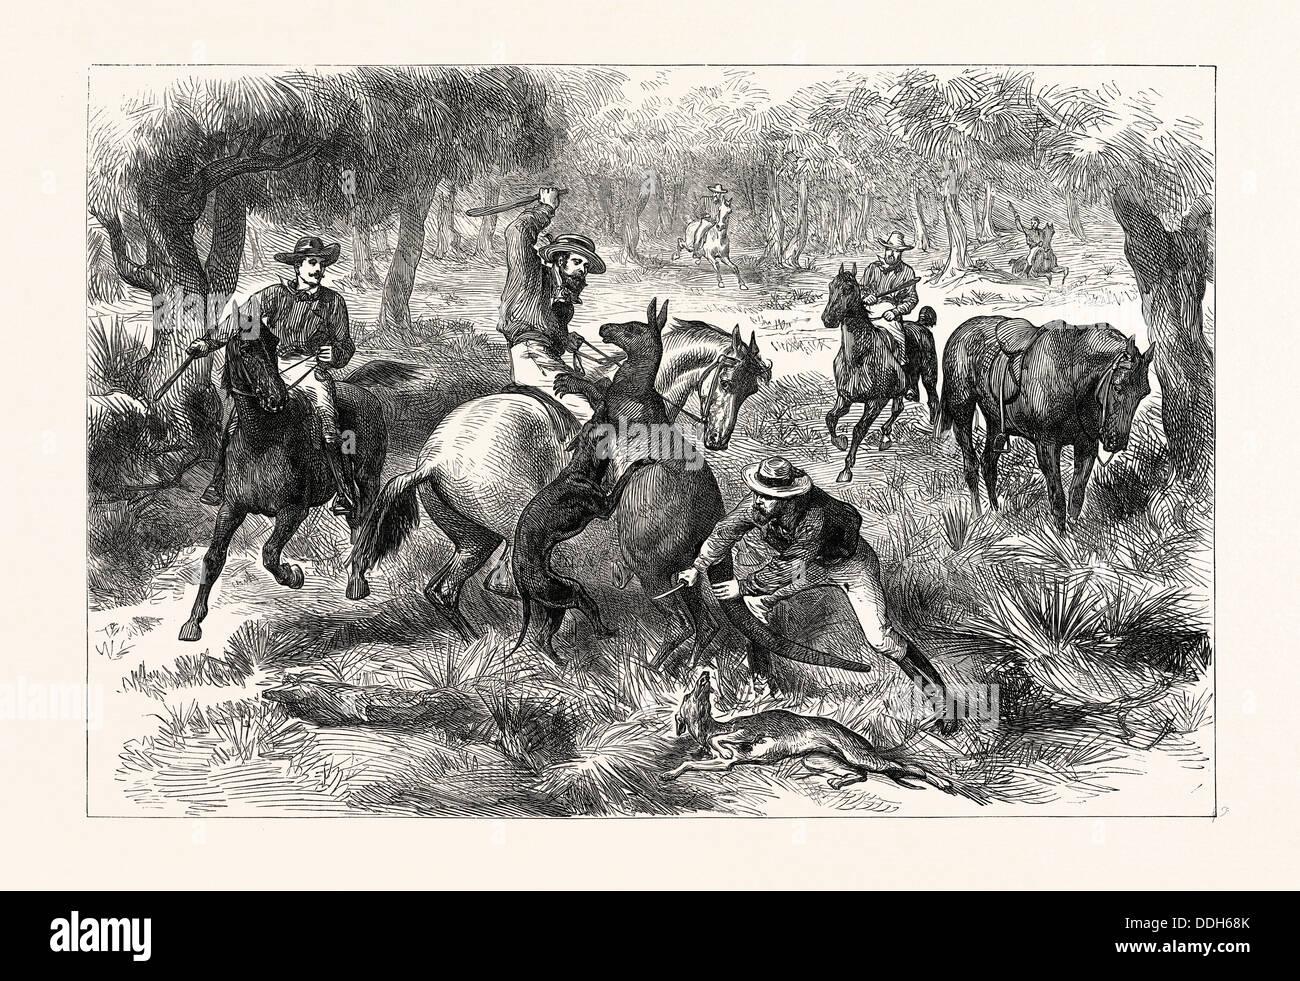 KANGAROO-HUNTING IN AUSTRALIA - Stock Image